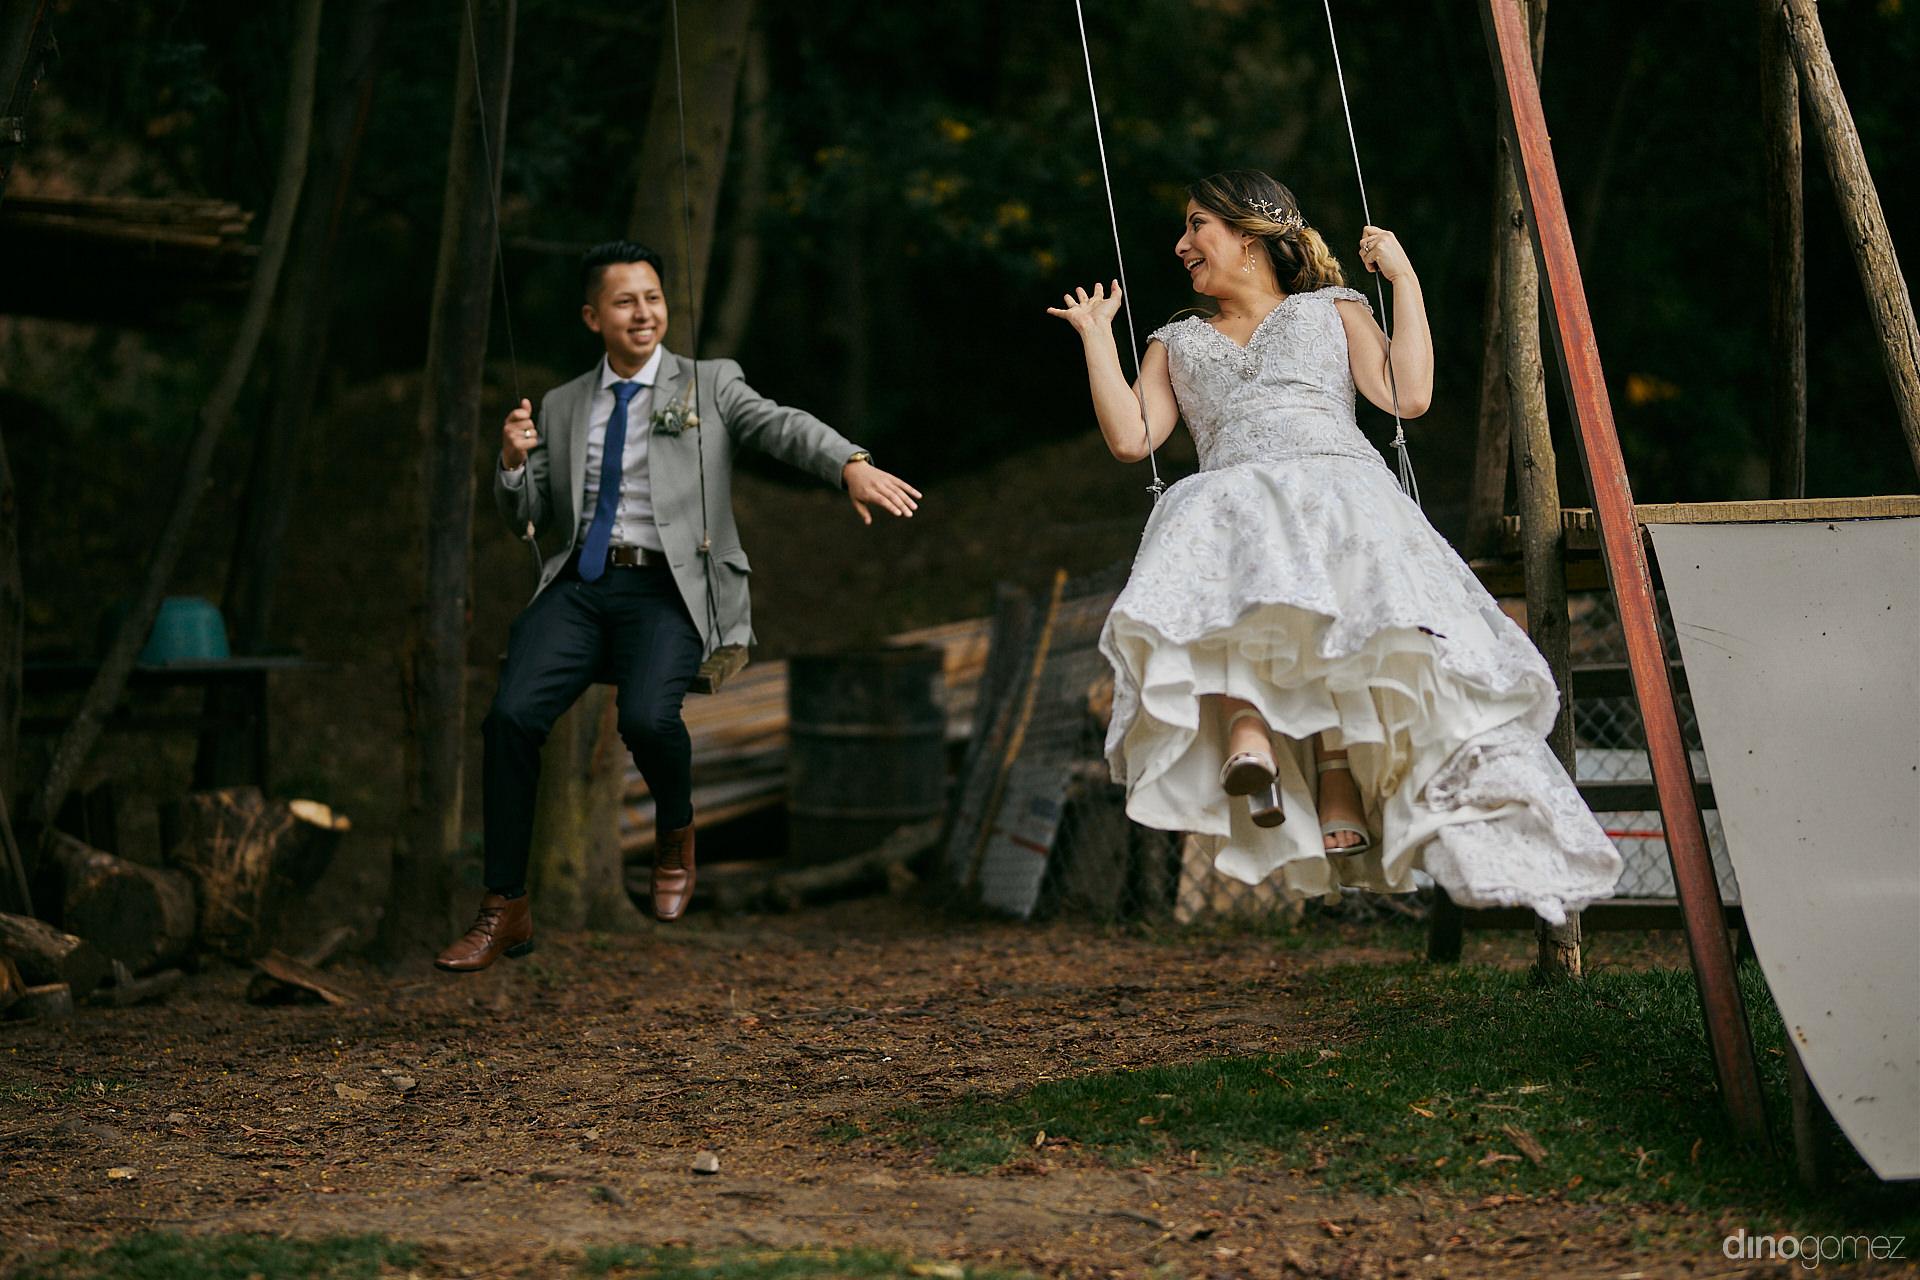 022 - Diy Budget Destination Weddings Can Be Prety Too!